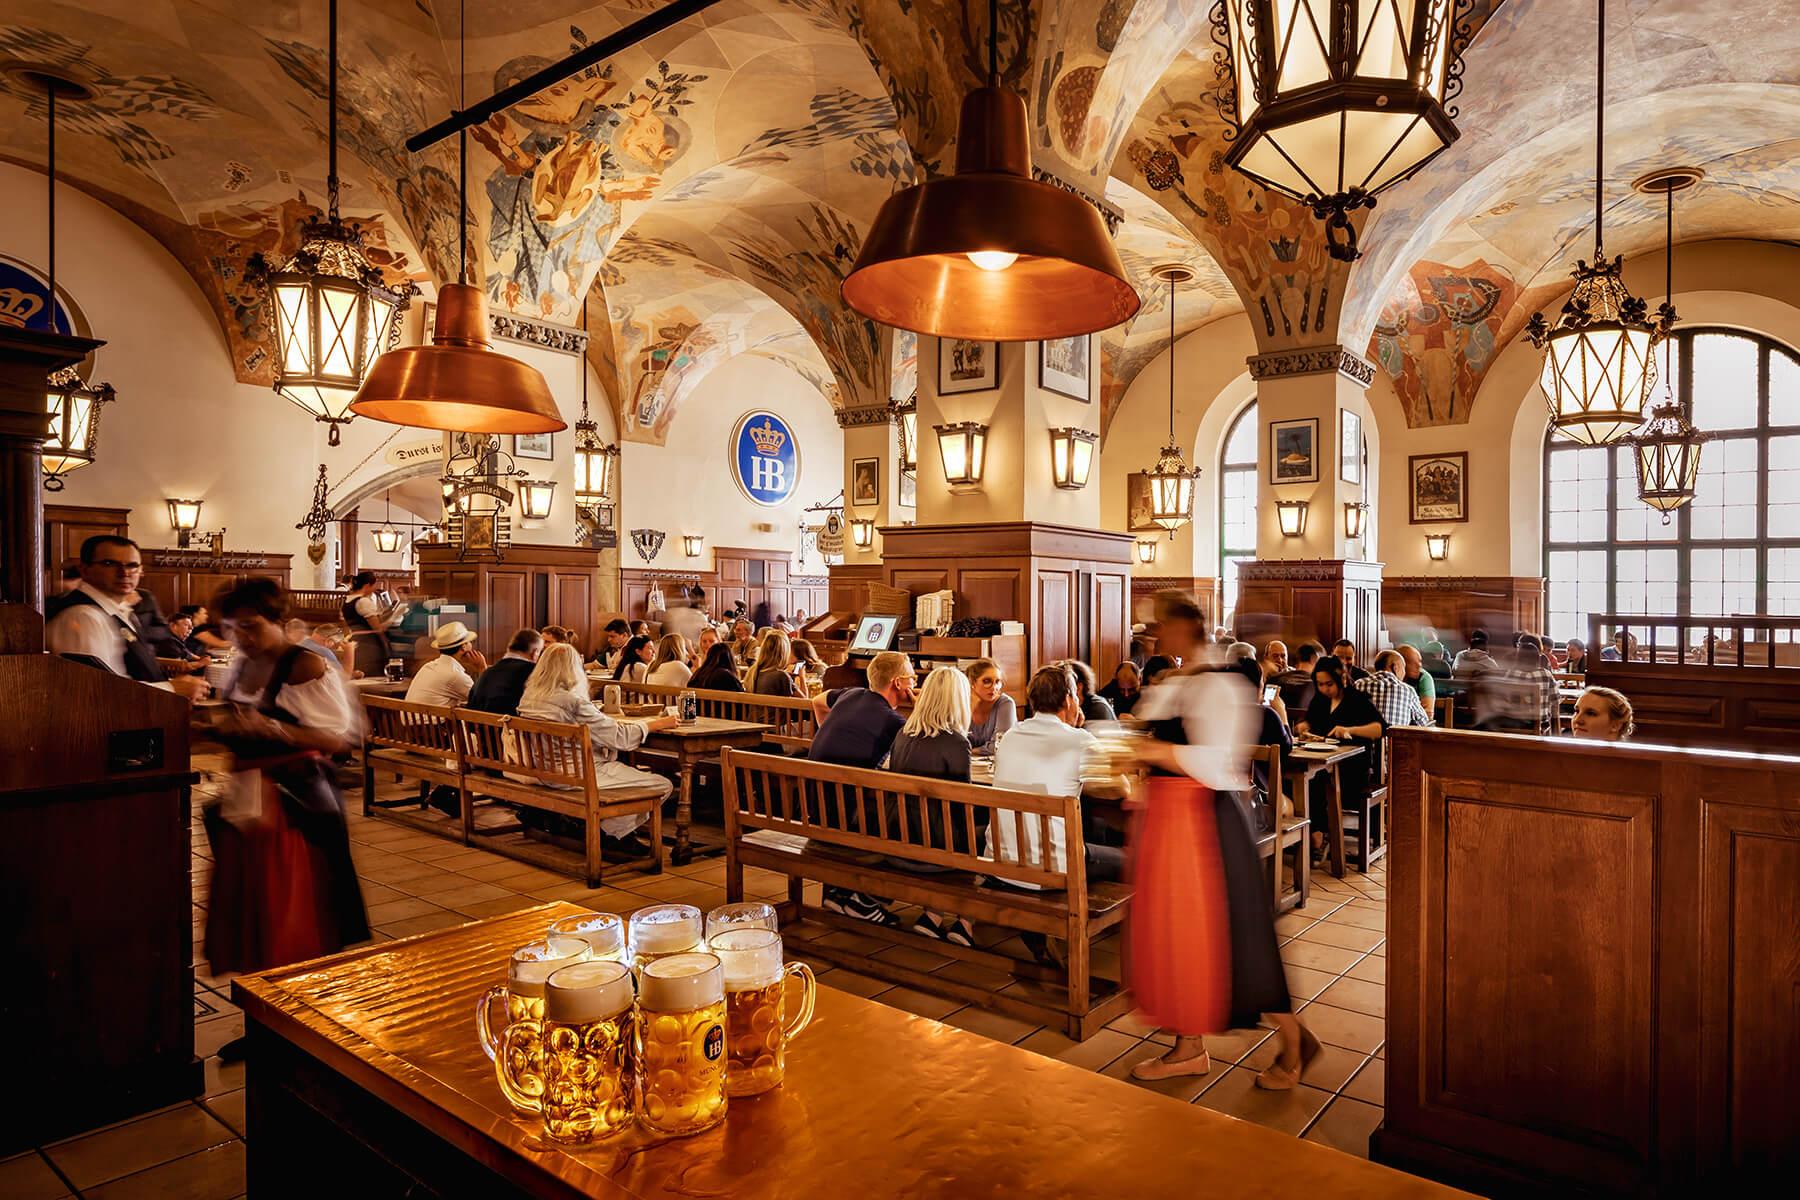 La Cucina München welcome hofbräuhaus